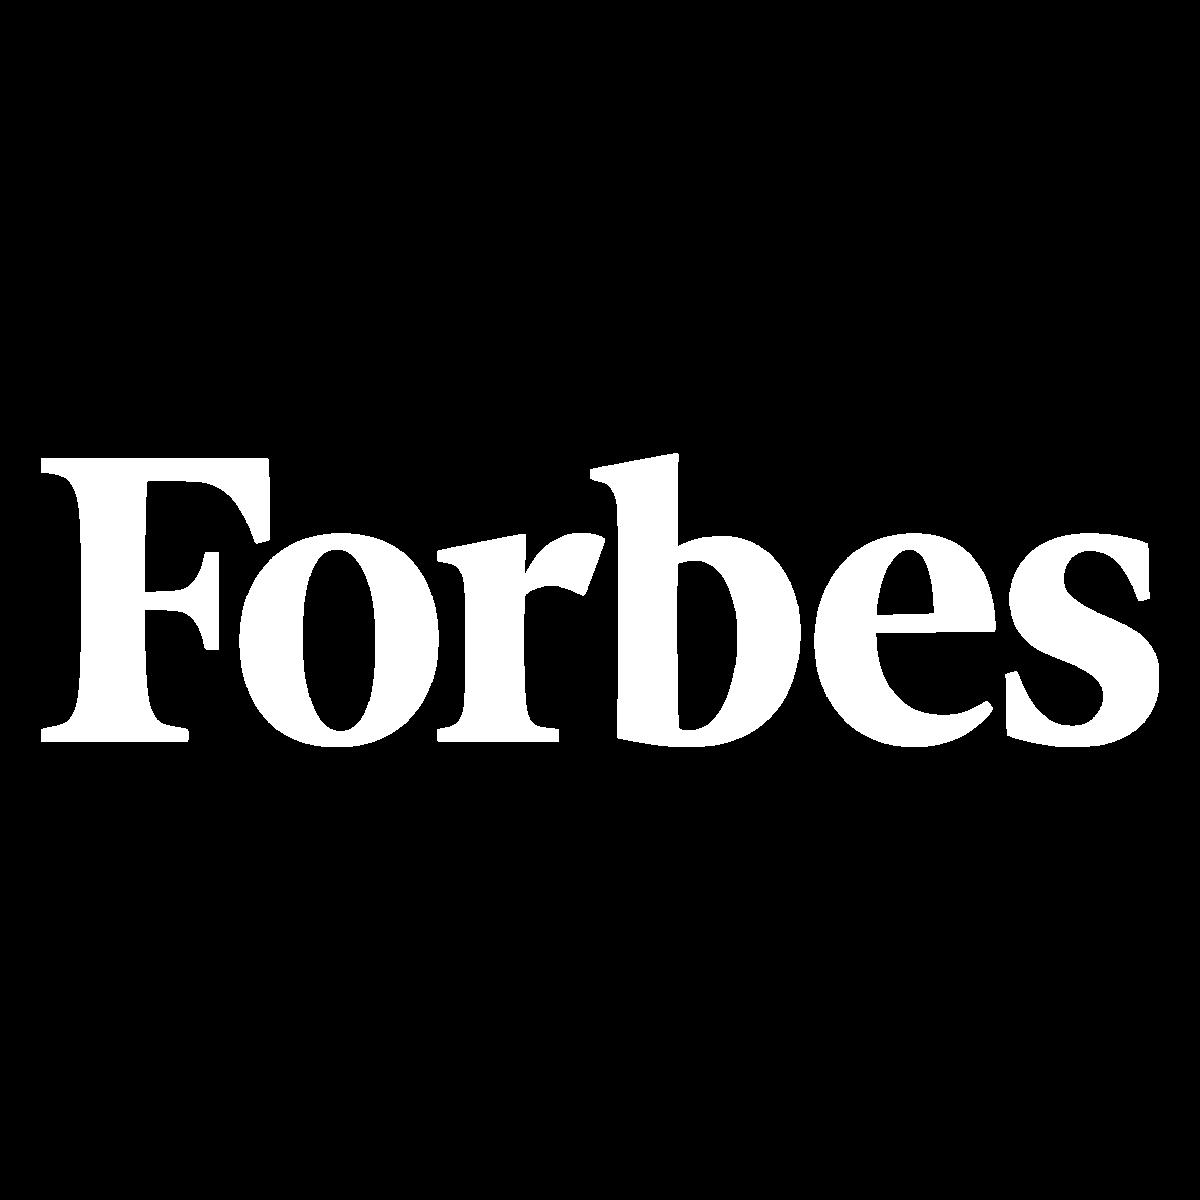 Forbes Magazin - Vivellio